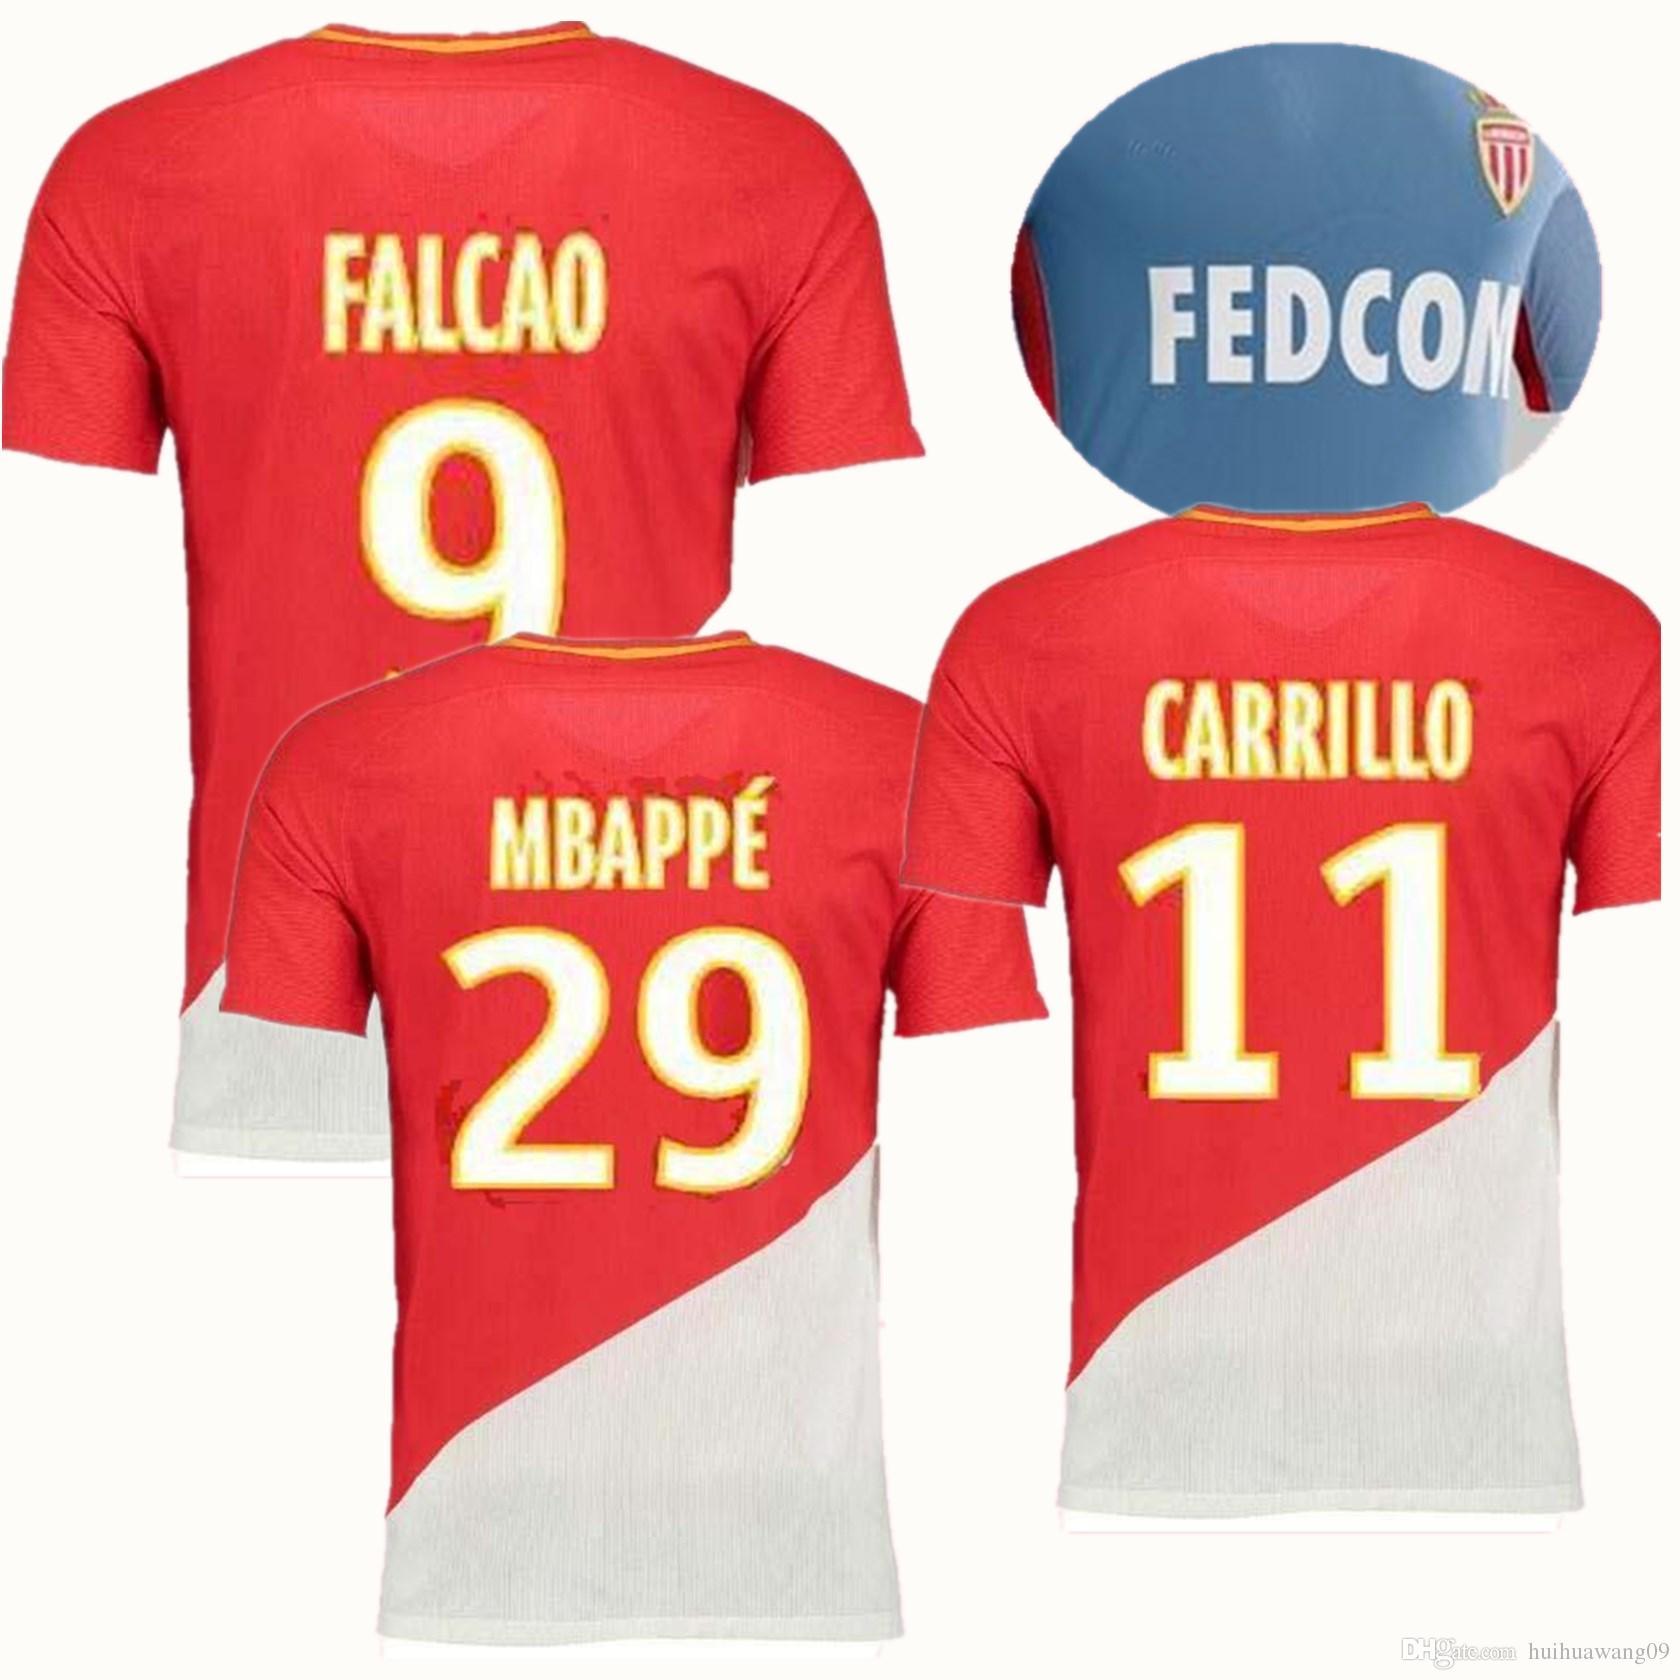 ... As Monaco Soccer Jerseys Bernardo Falcao Mbappe Home Kit Red Jersey  Moutinho Carrillo 17 18 Away Monaco Jersey Football Shirts Under $16.1 |  Dhgate.Com